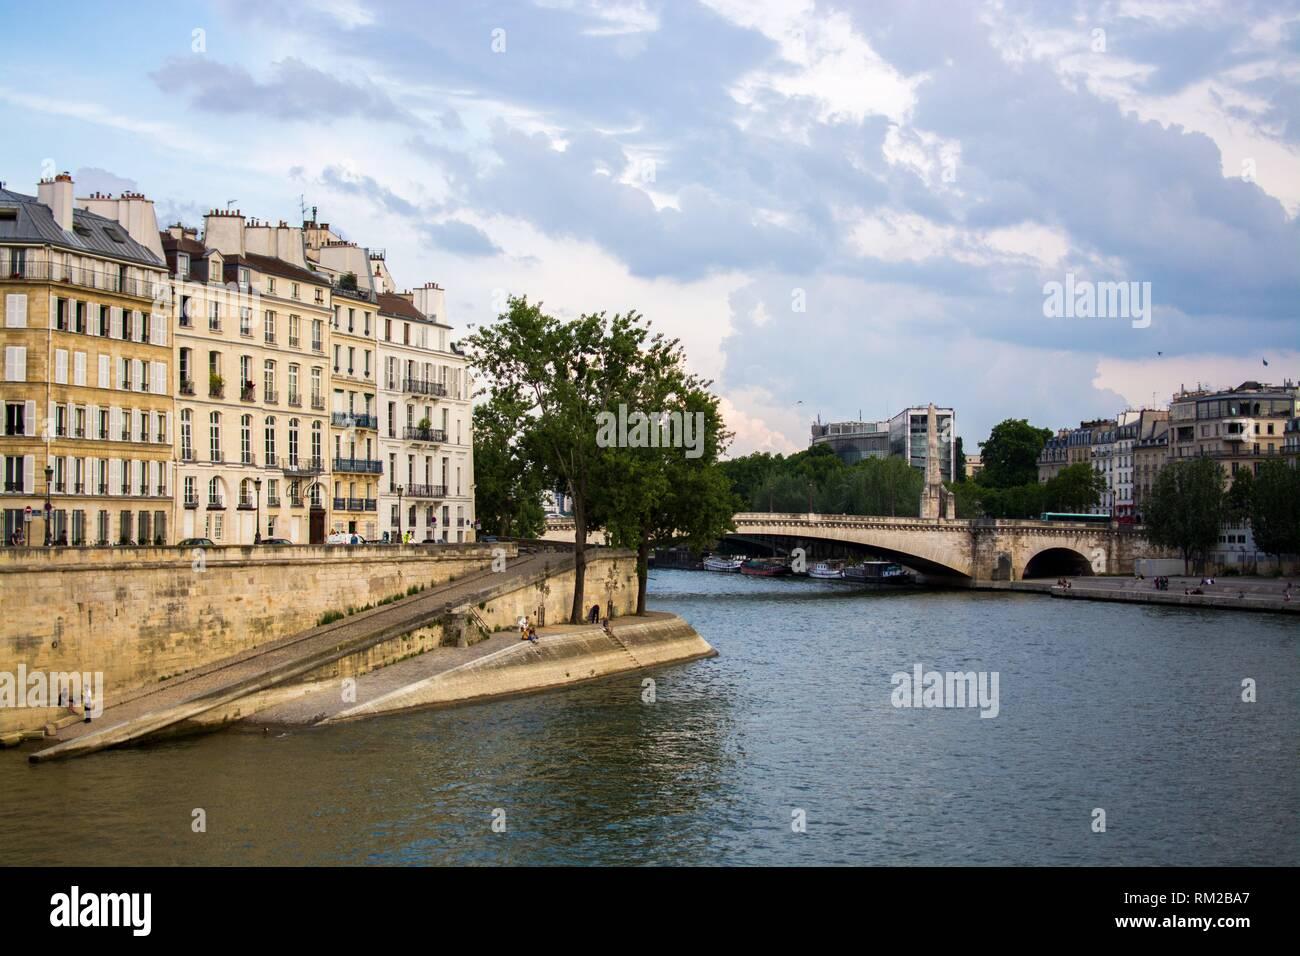 View of the Seine river and Pont de la Tournelle bridge in a sunny day. Paris, France. - Stock Image